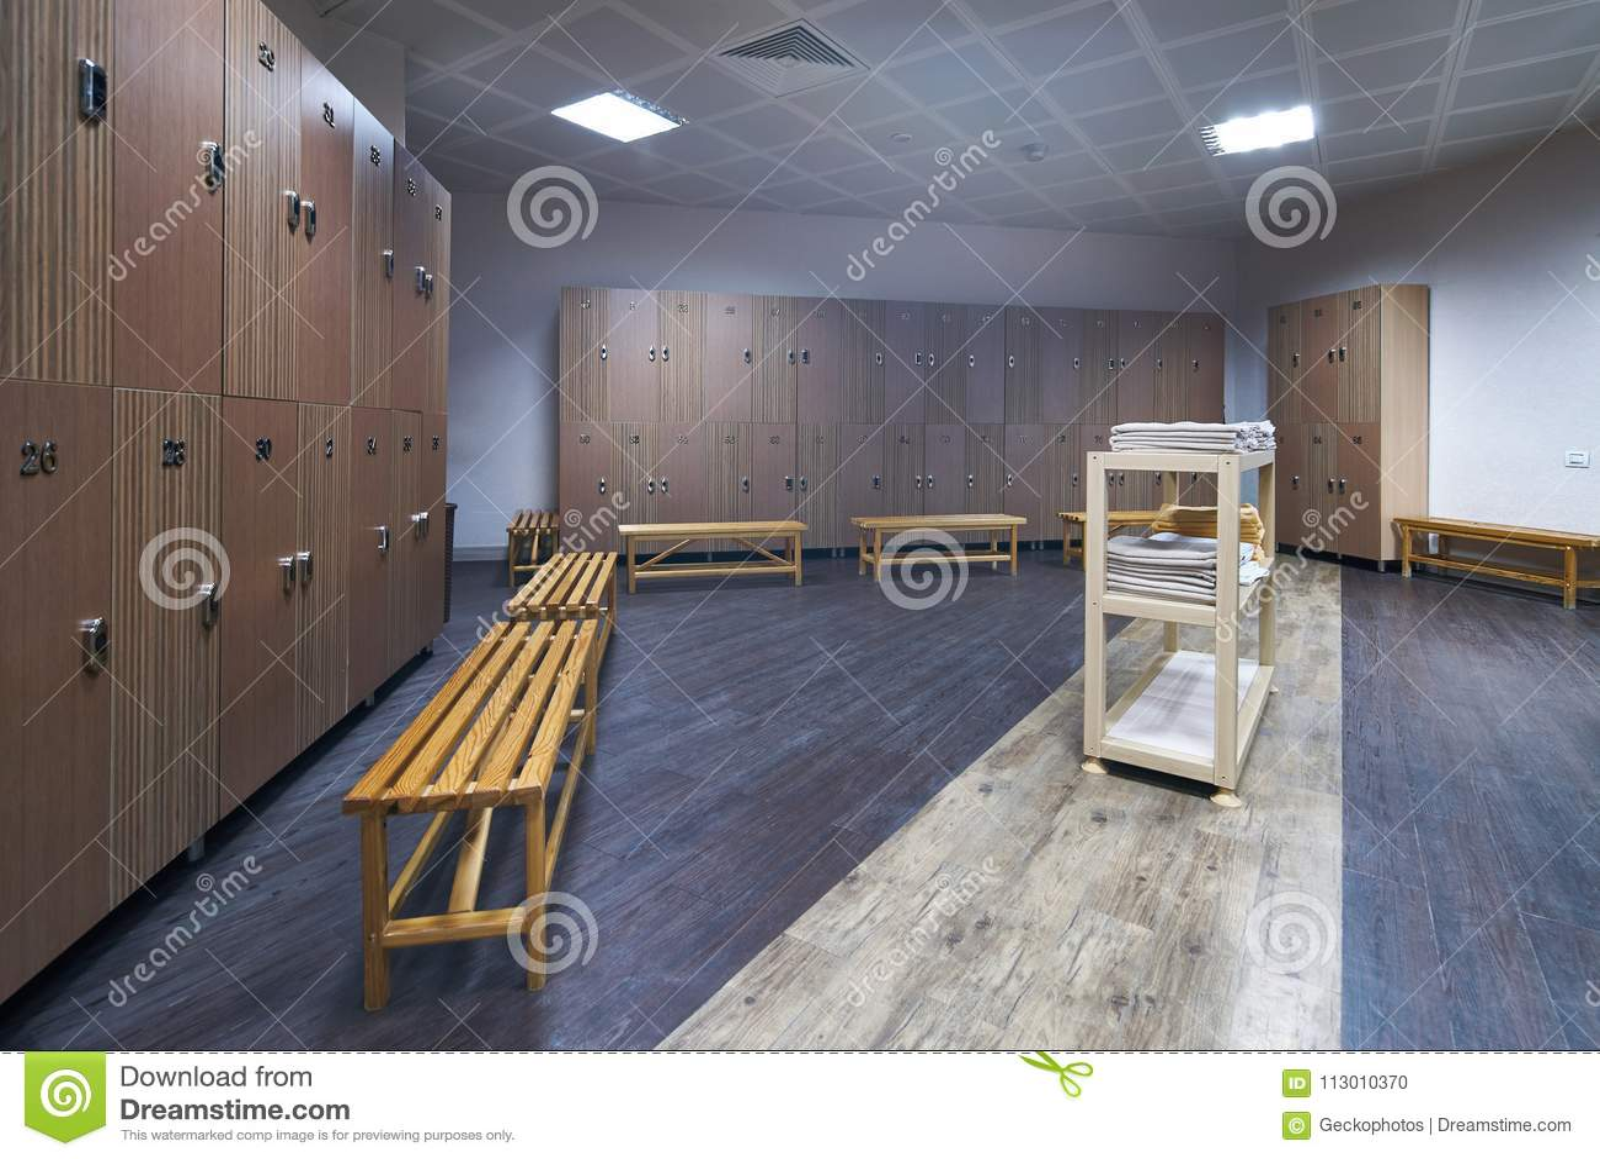 Interior of gym locker room stock photo image of interior